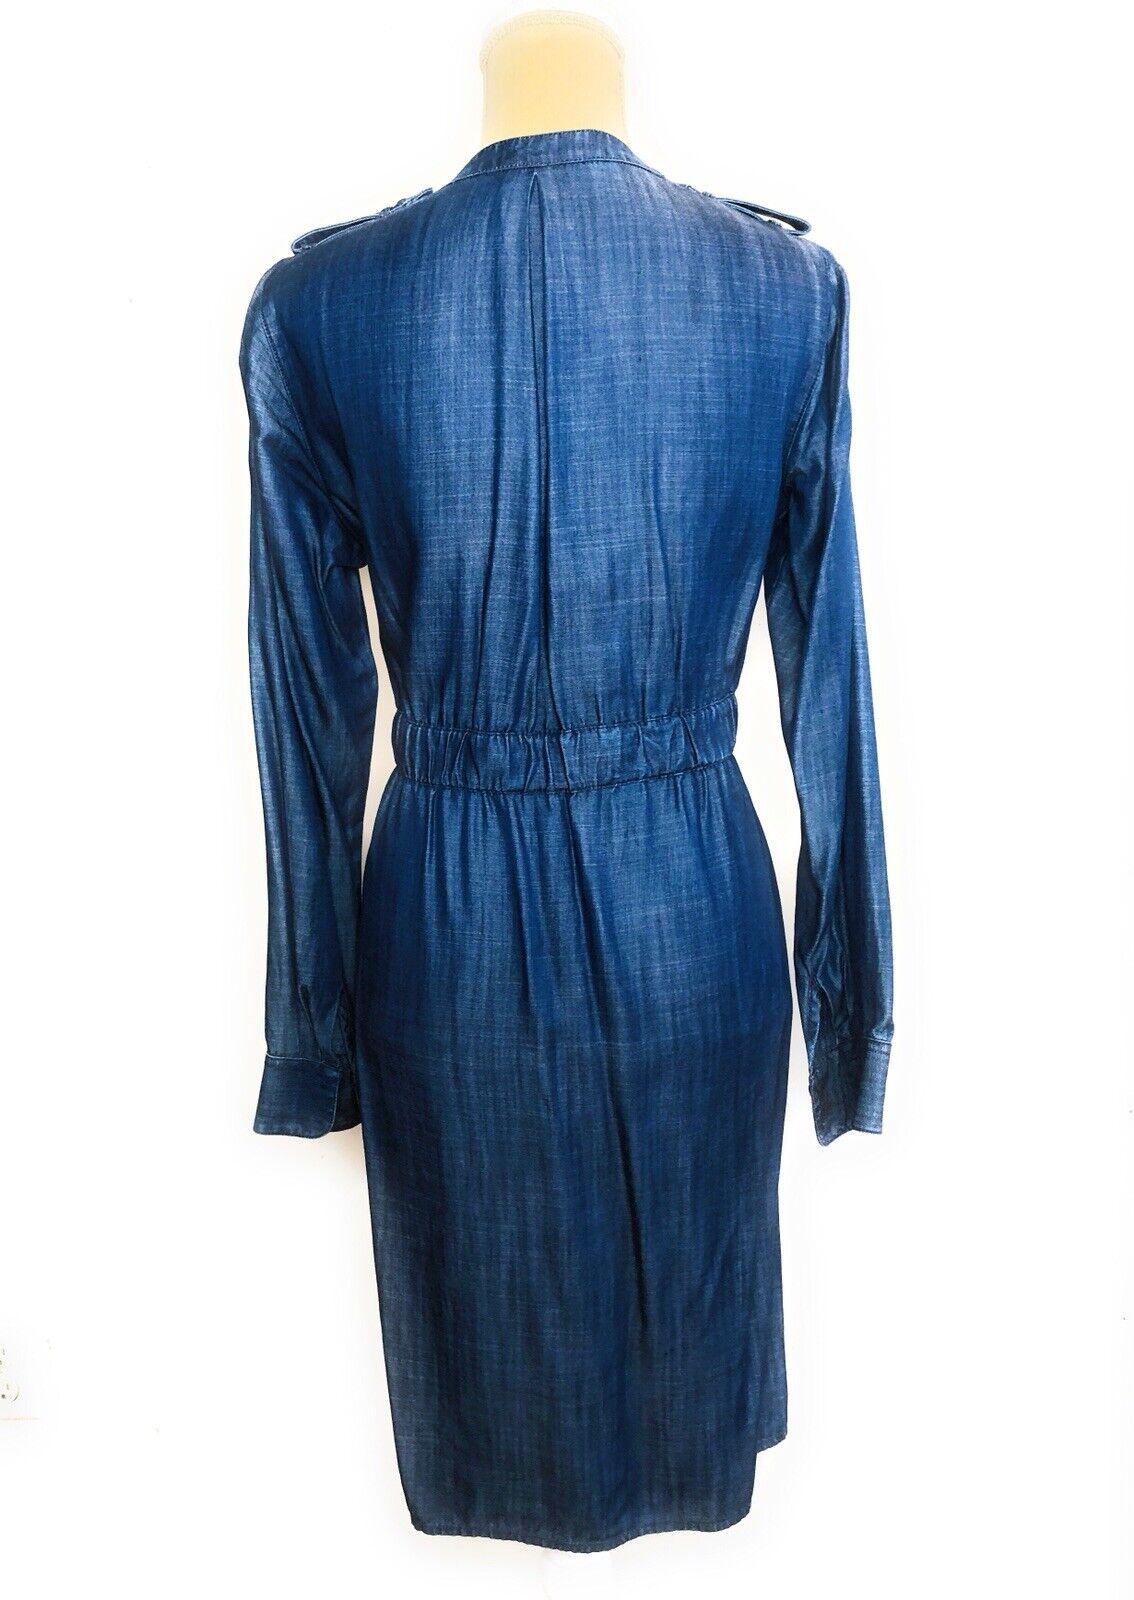 9bf3afcba0ba2 ... Foxcroft denim denim denim tencel drawstring dress Longsleeve Size 6  04c382 ...